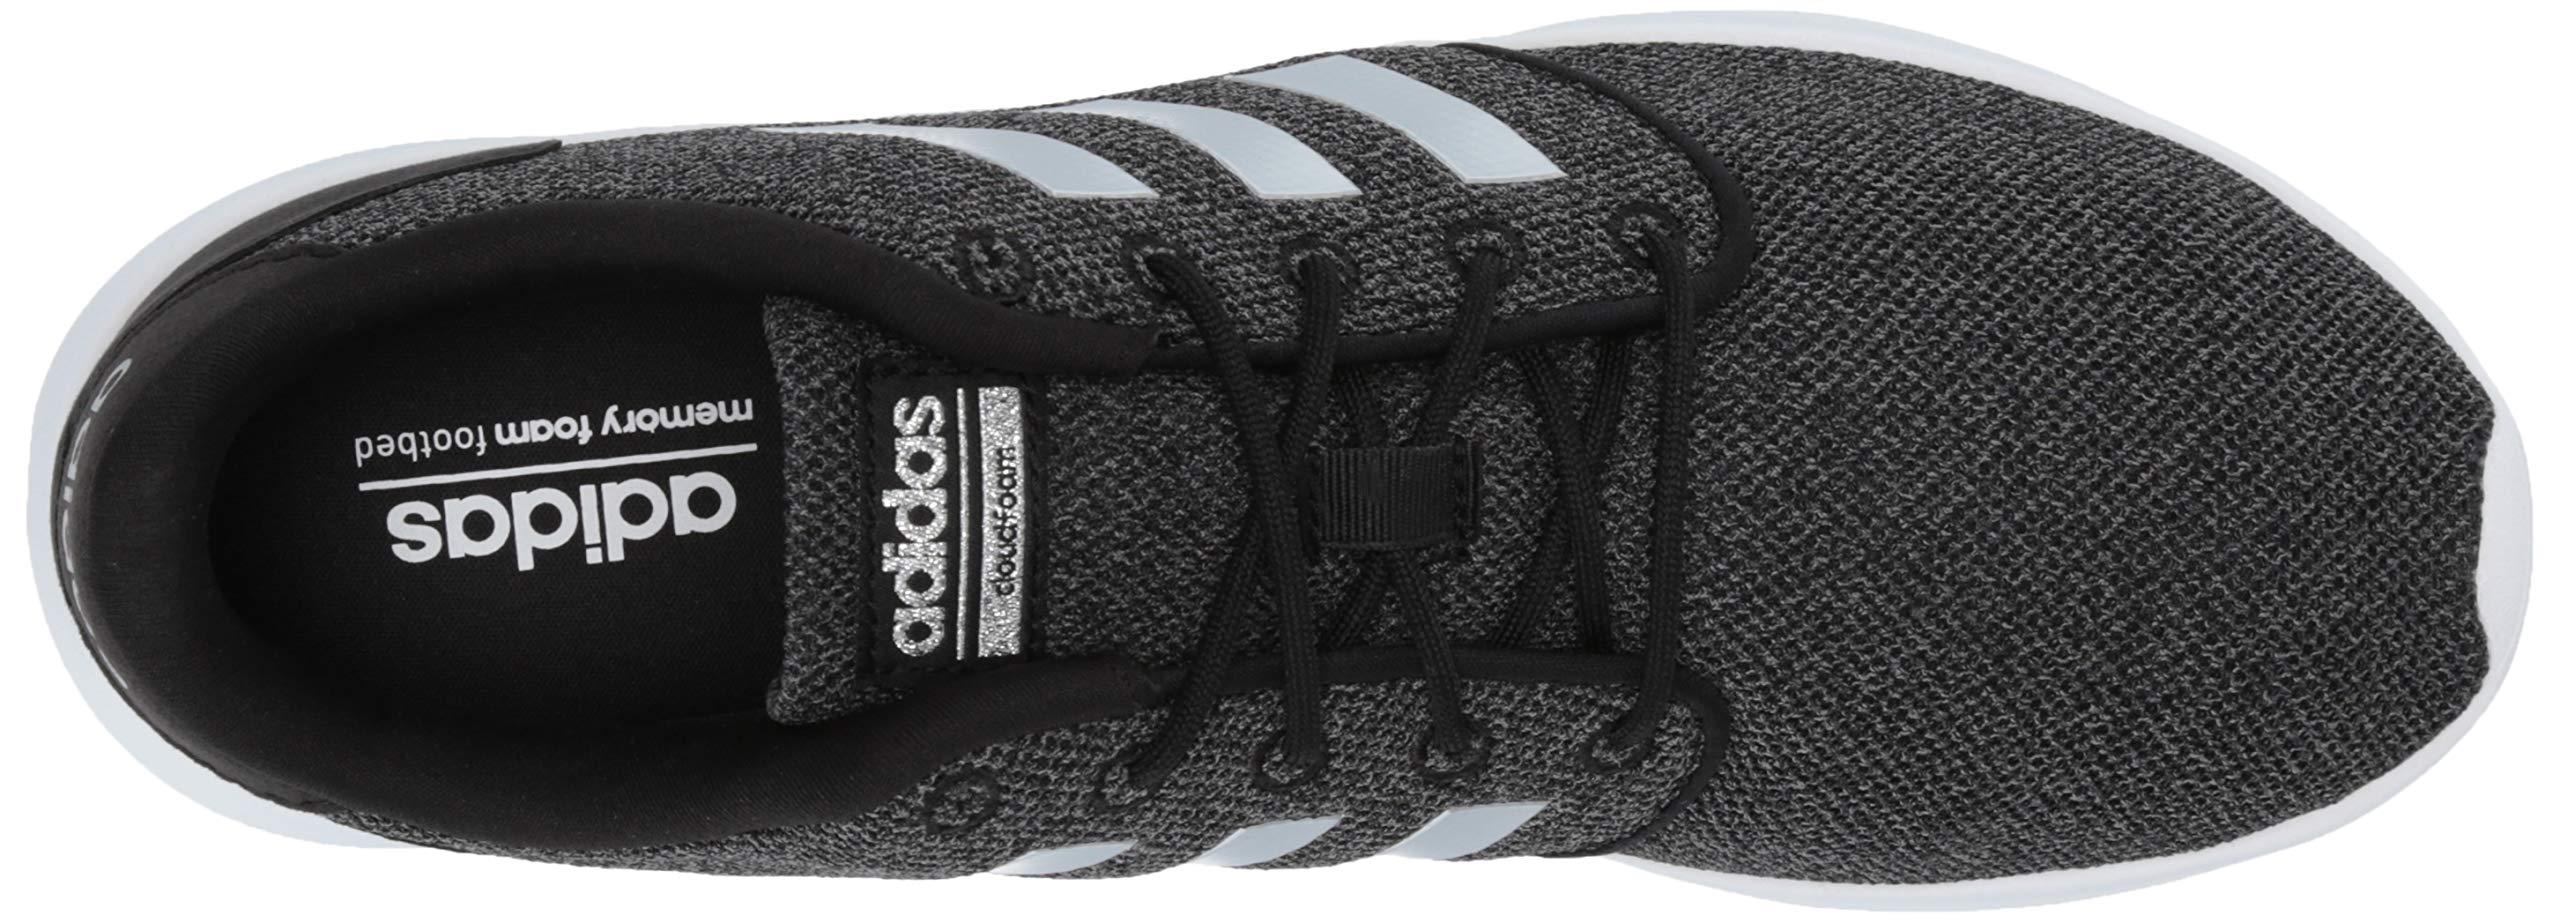 adidas Women's Cloudfoam Qt Racer Sneaker, Black/Silver Metallic/Grey, 5.5 M US by adidas (Image #7)